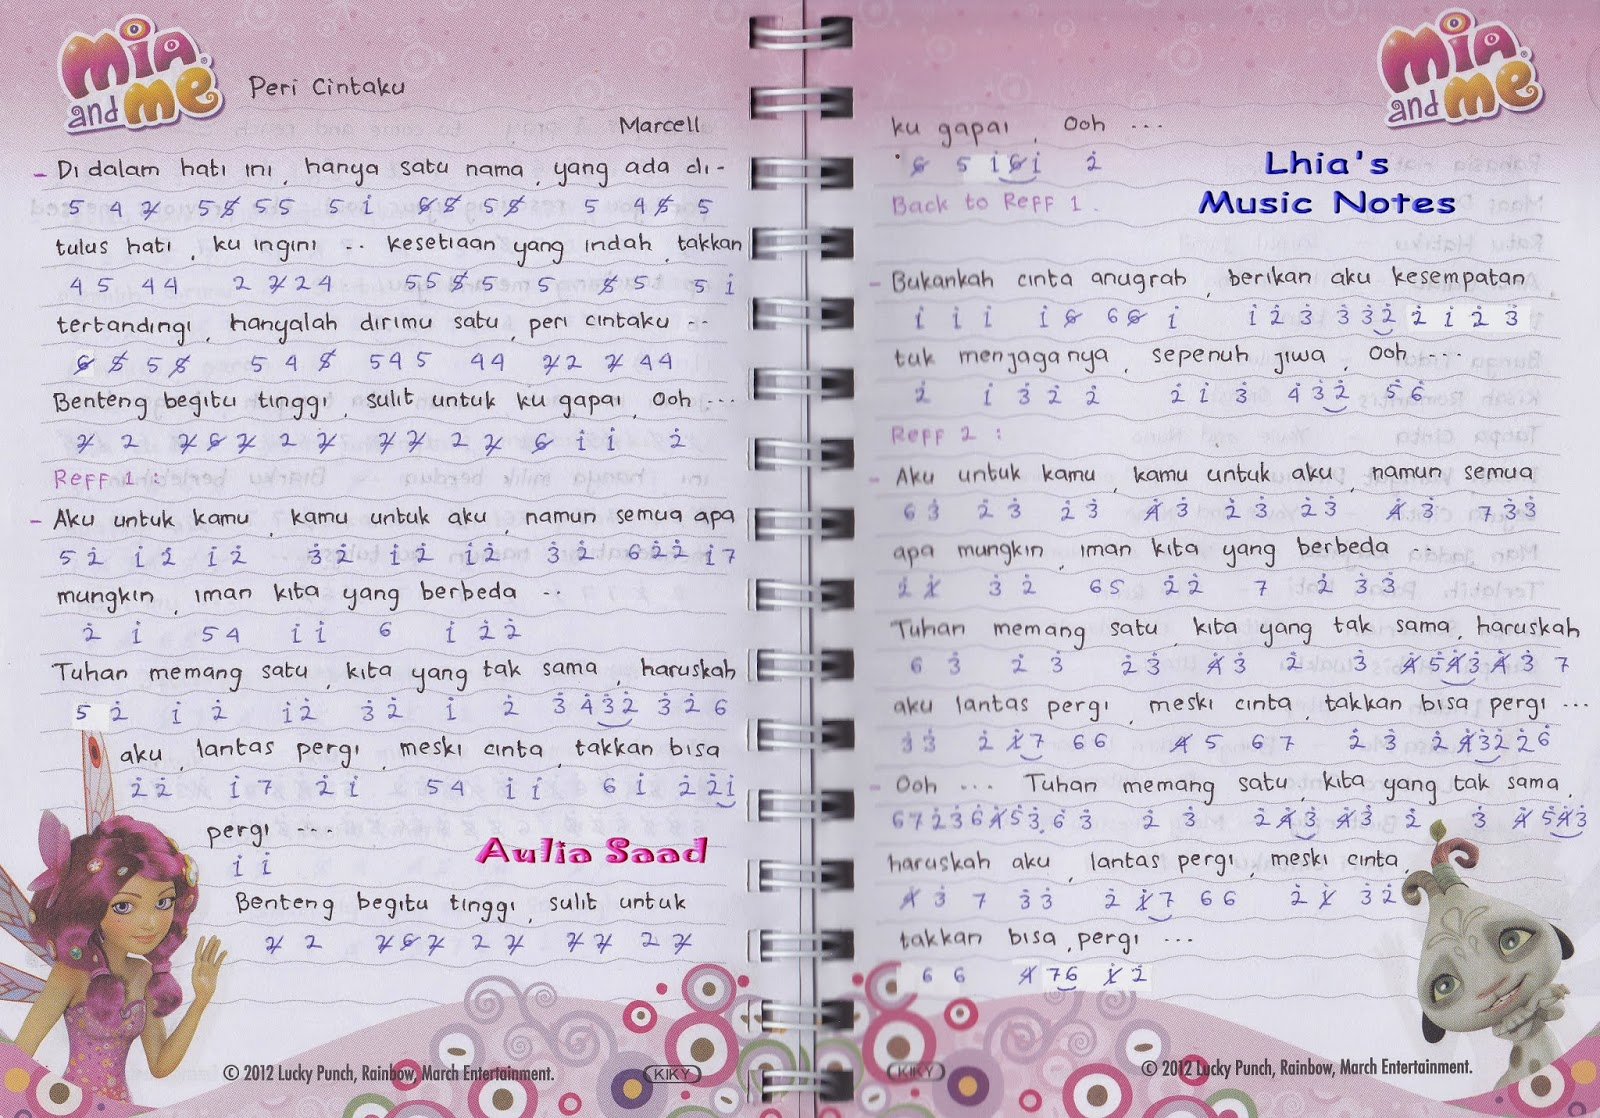 Surat Cinta Untuk Starla Chord - bliblinews.com